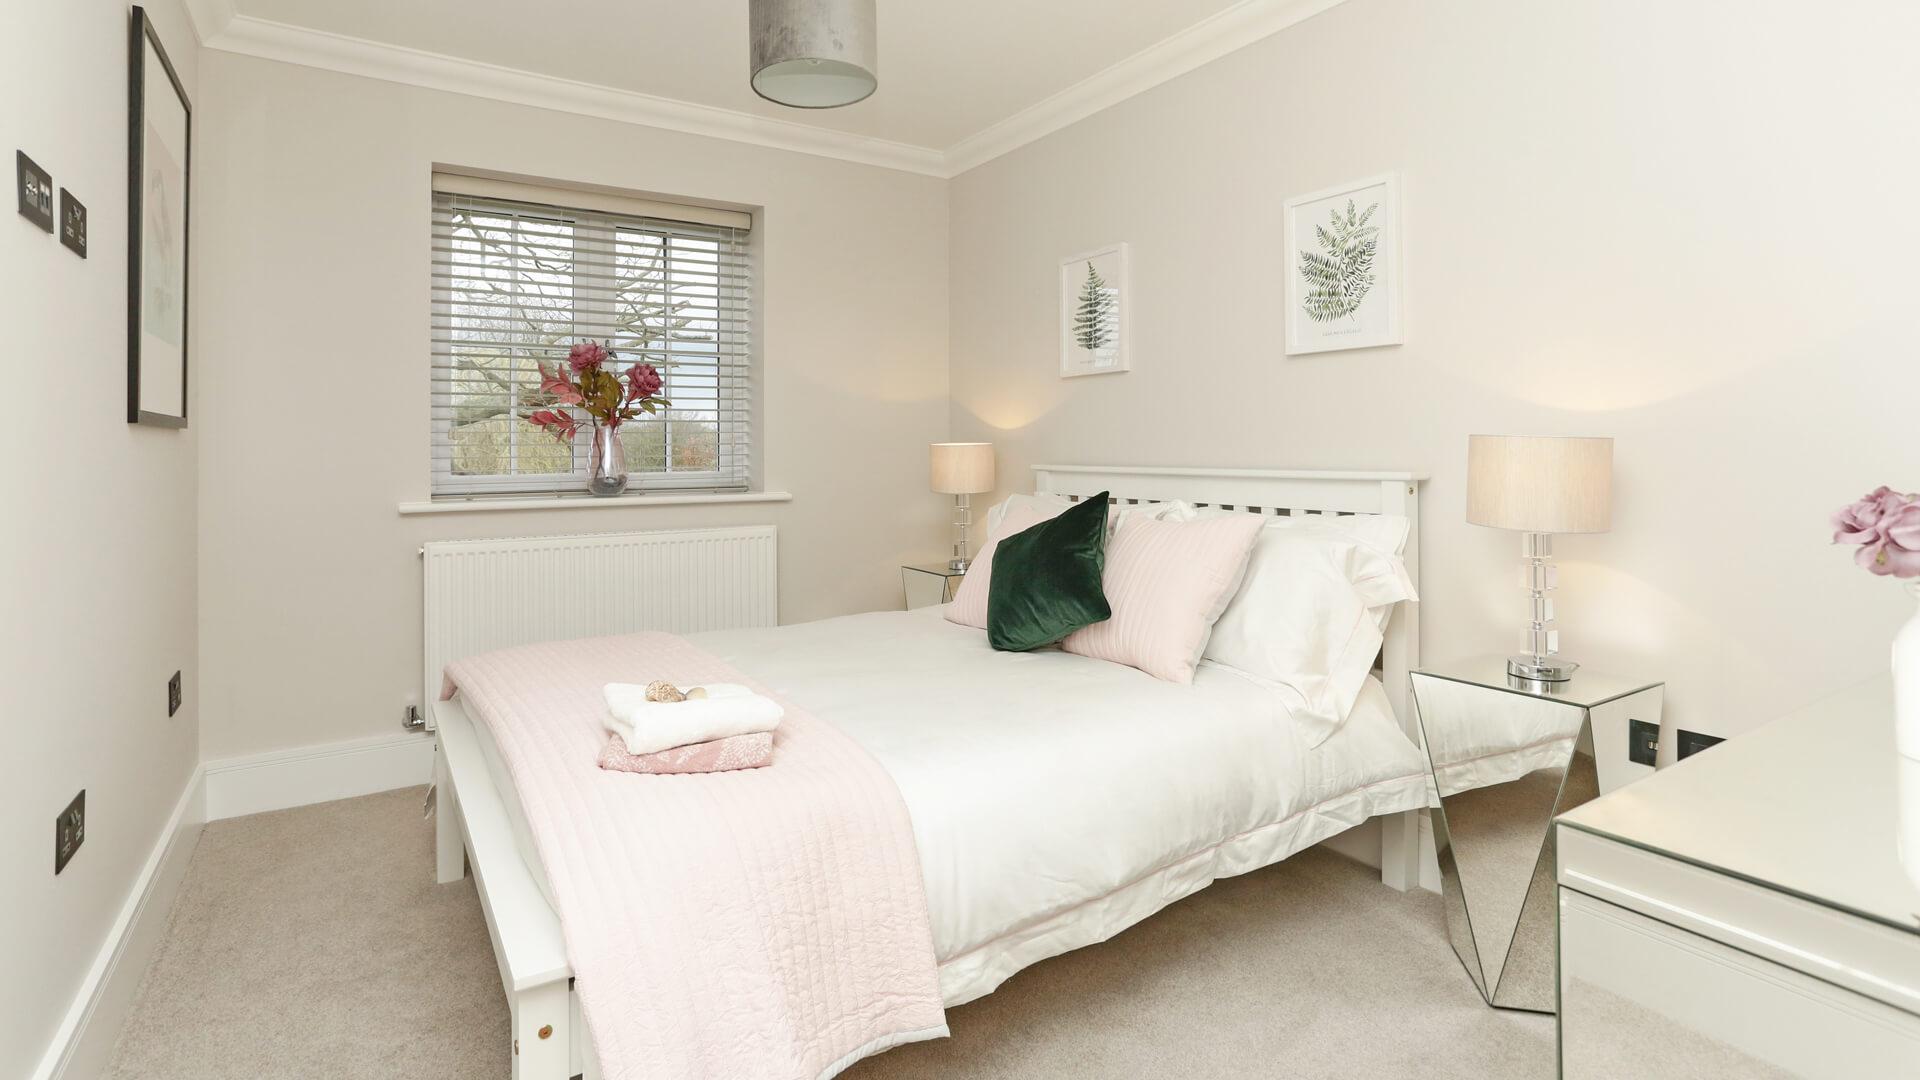 Bedroom 4 at Plot 8 Weavers park.